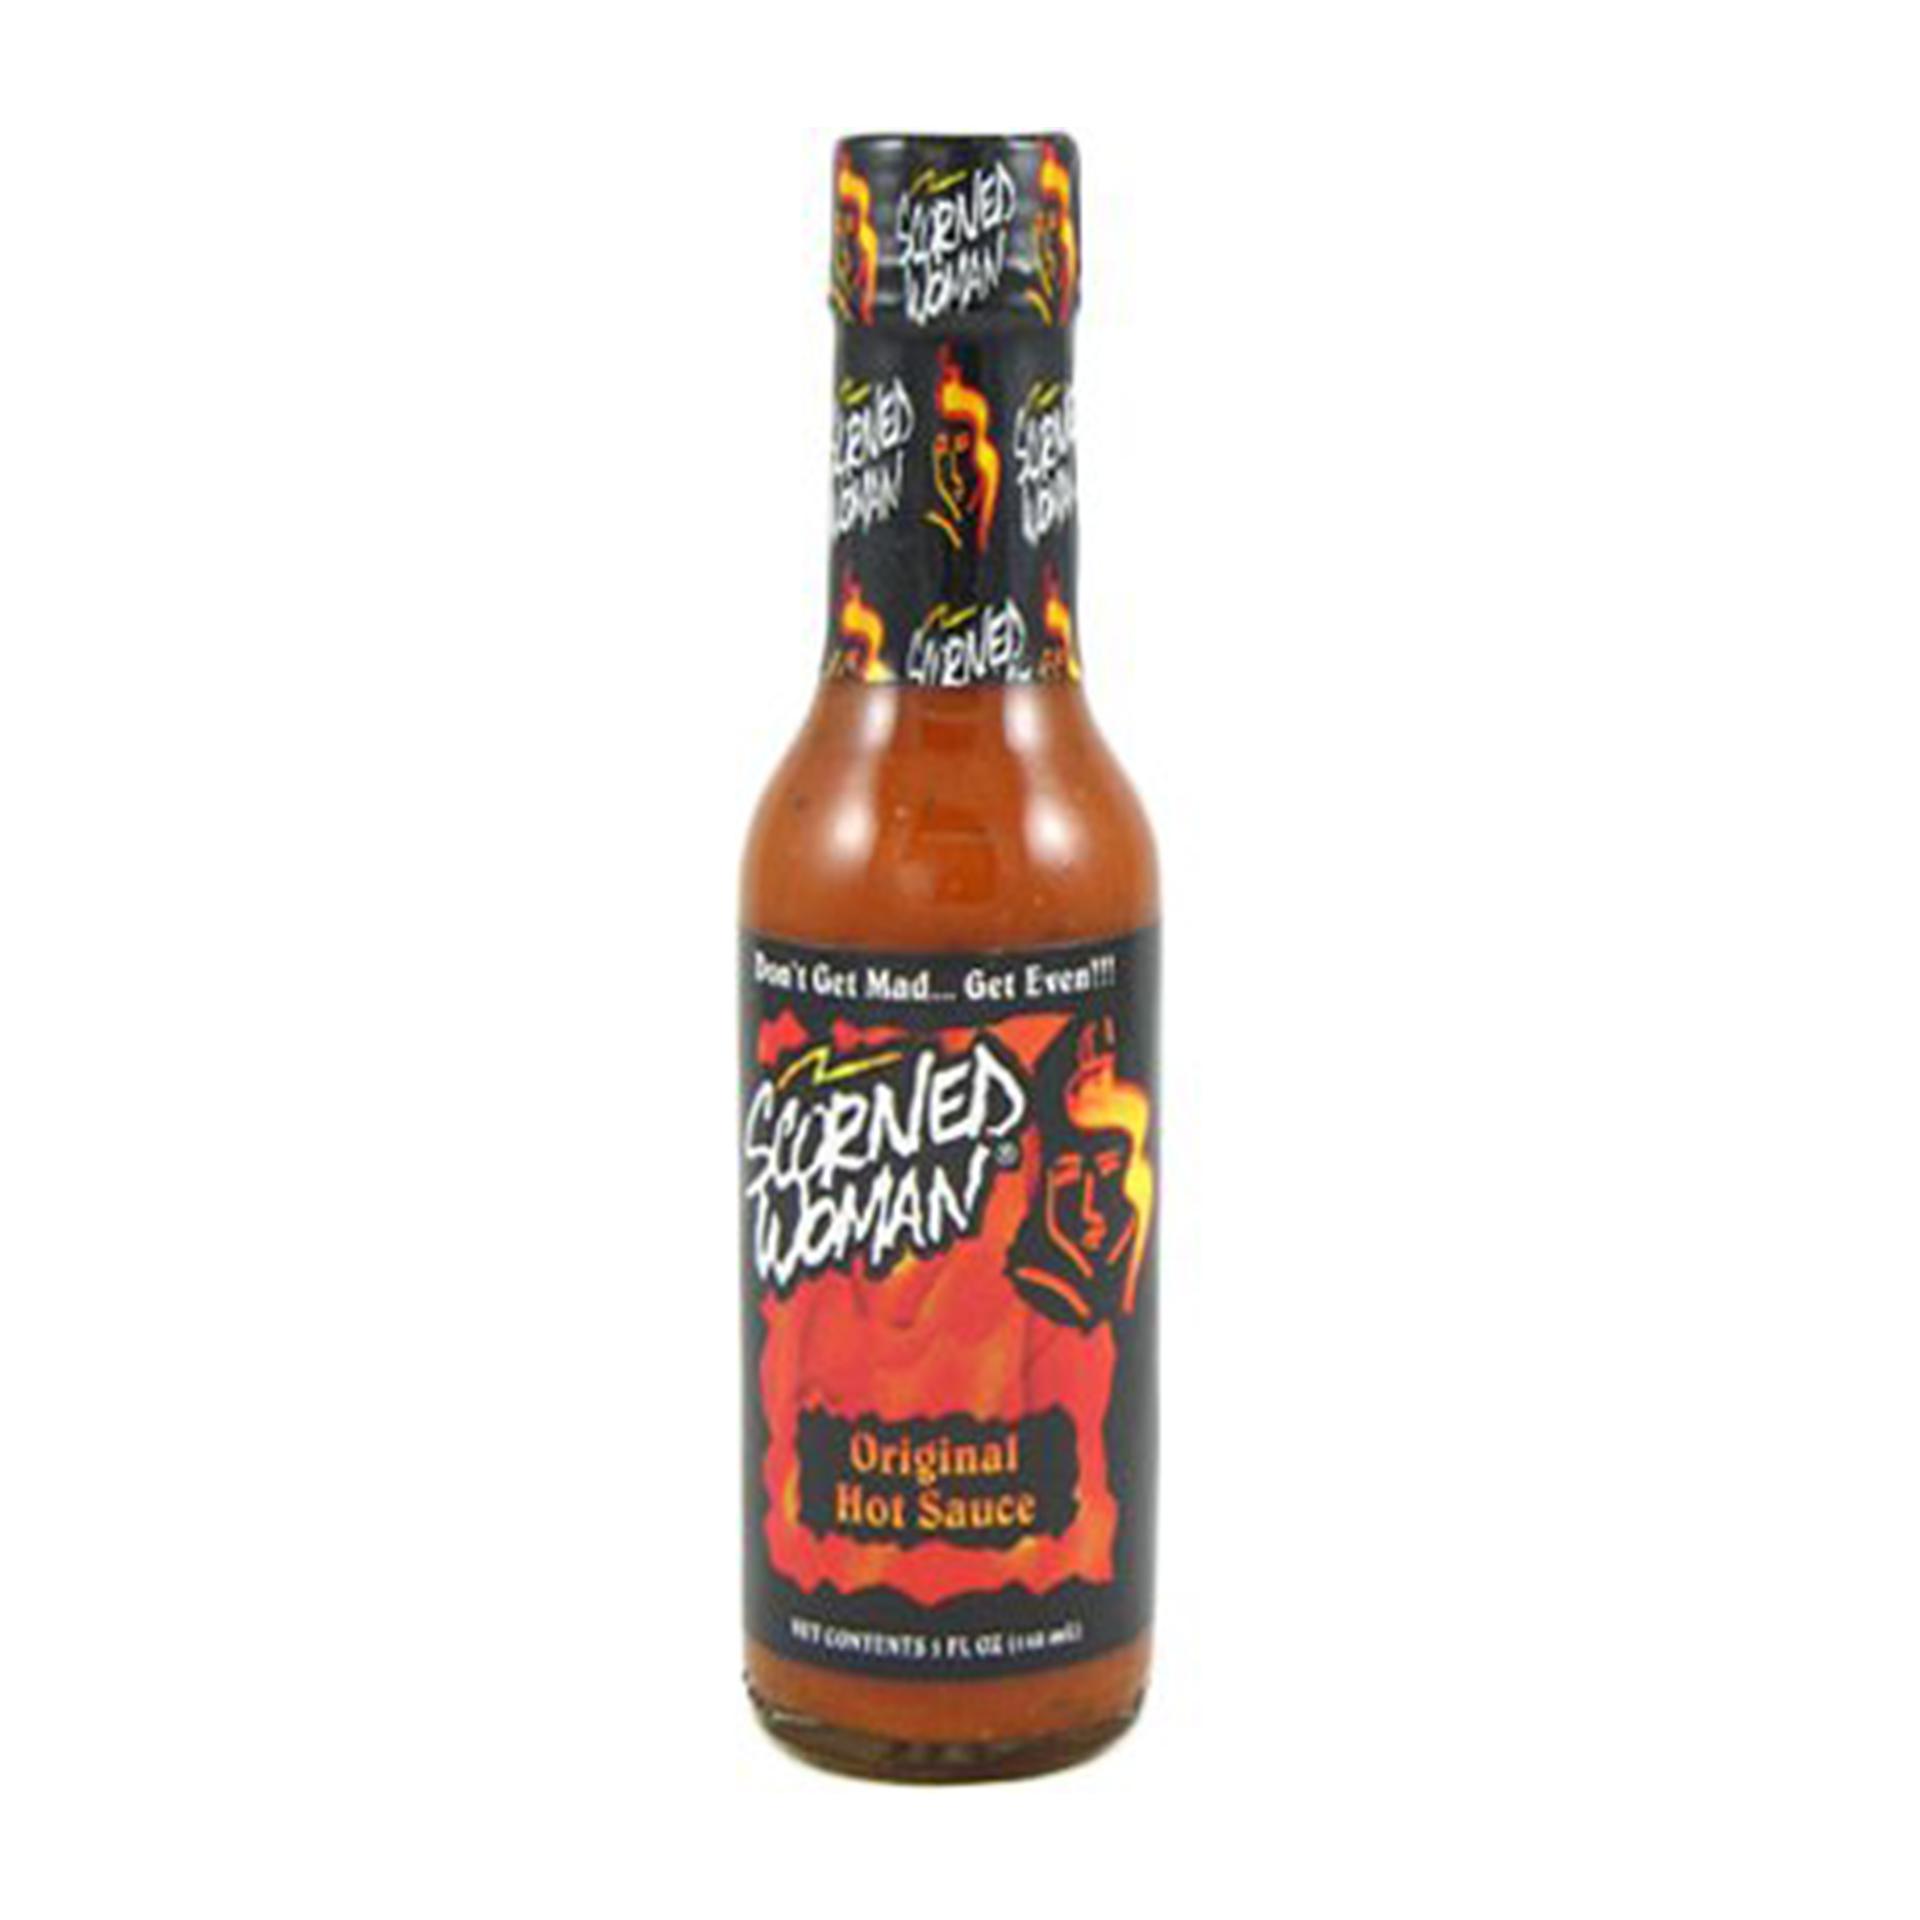 Scorned Woman Hot Sauce 5oz. (3 Pack) -